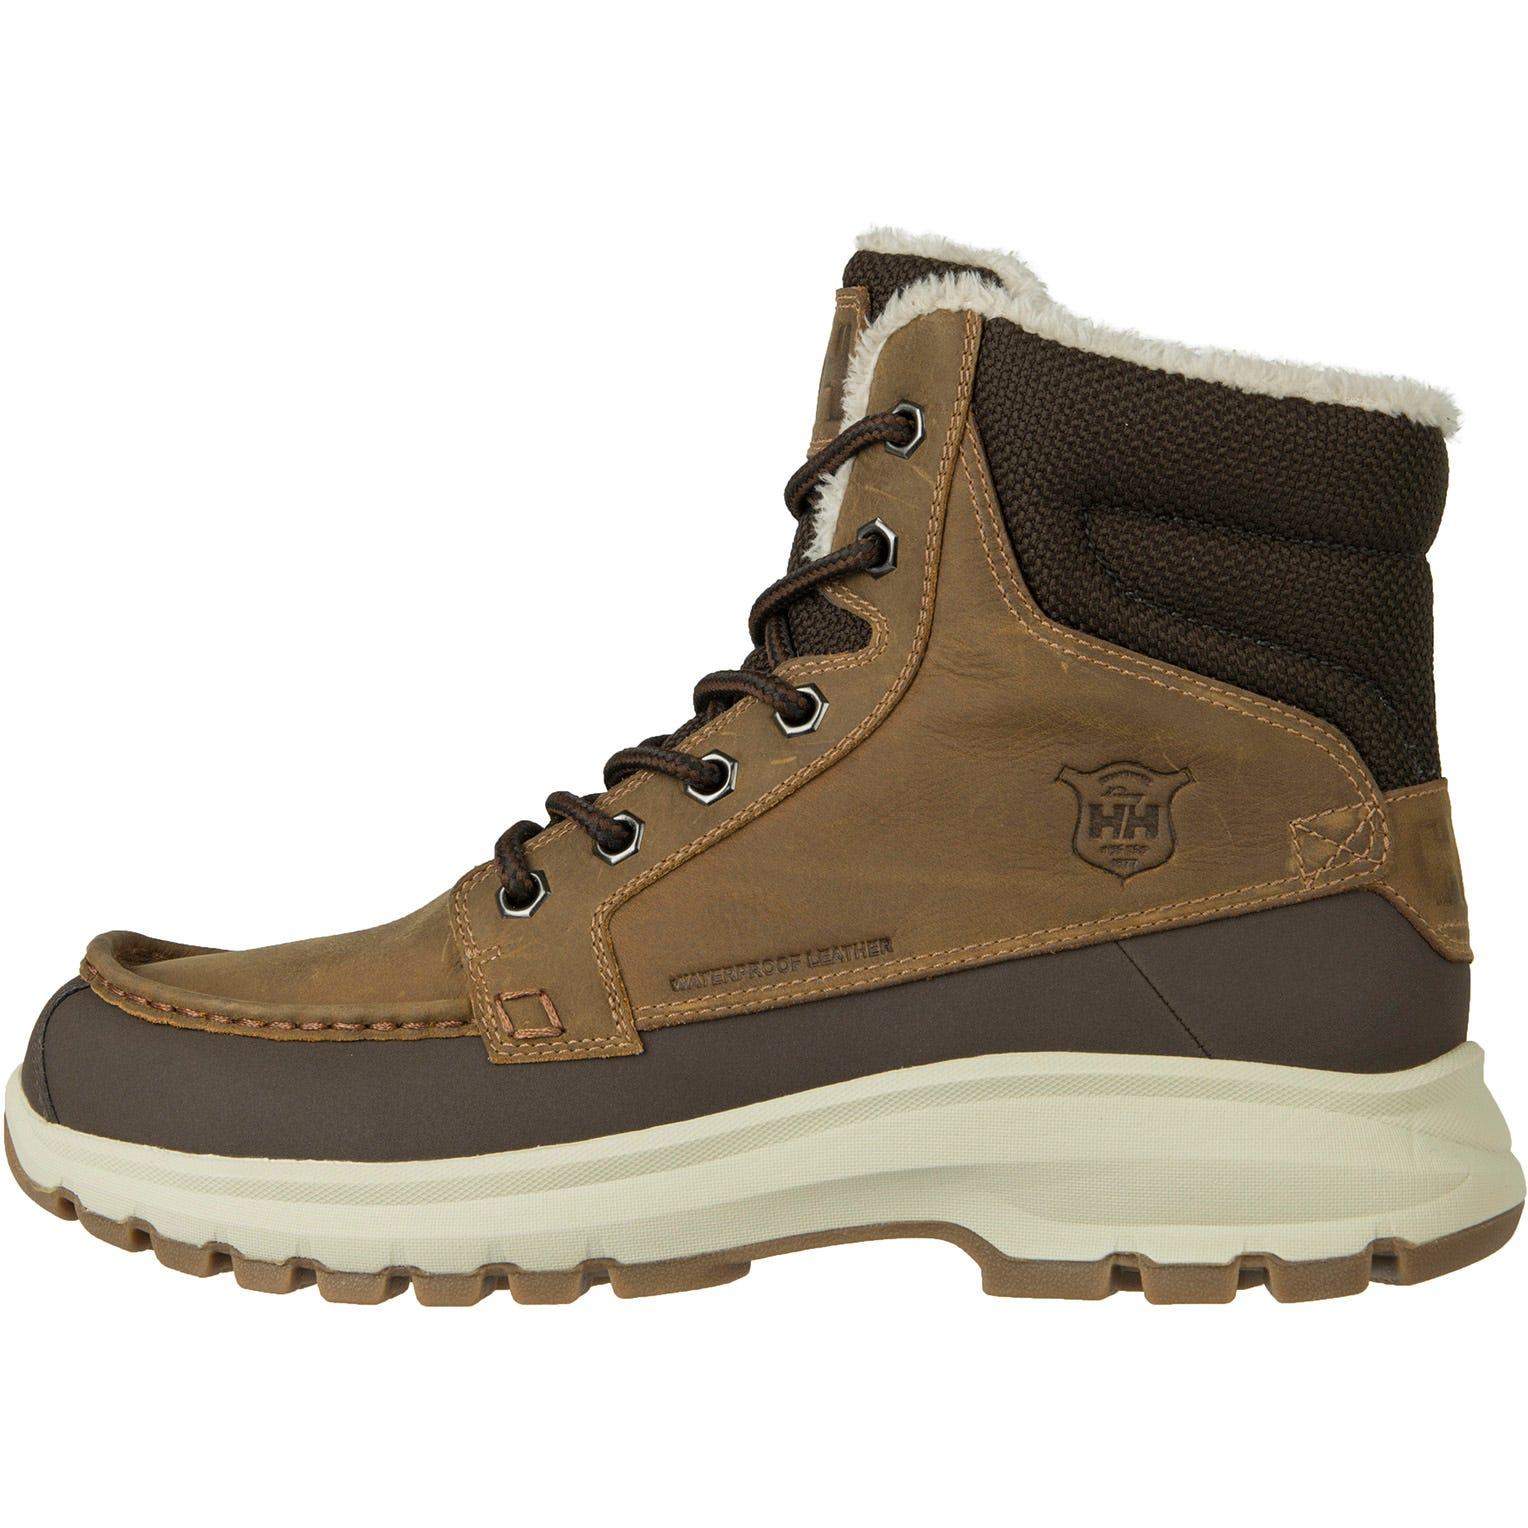 Helly Hansen Garibaldi V3 Mens :casual Shoe Brown 42.5/9